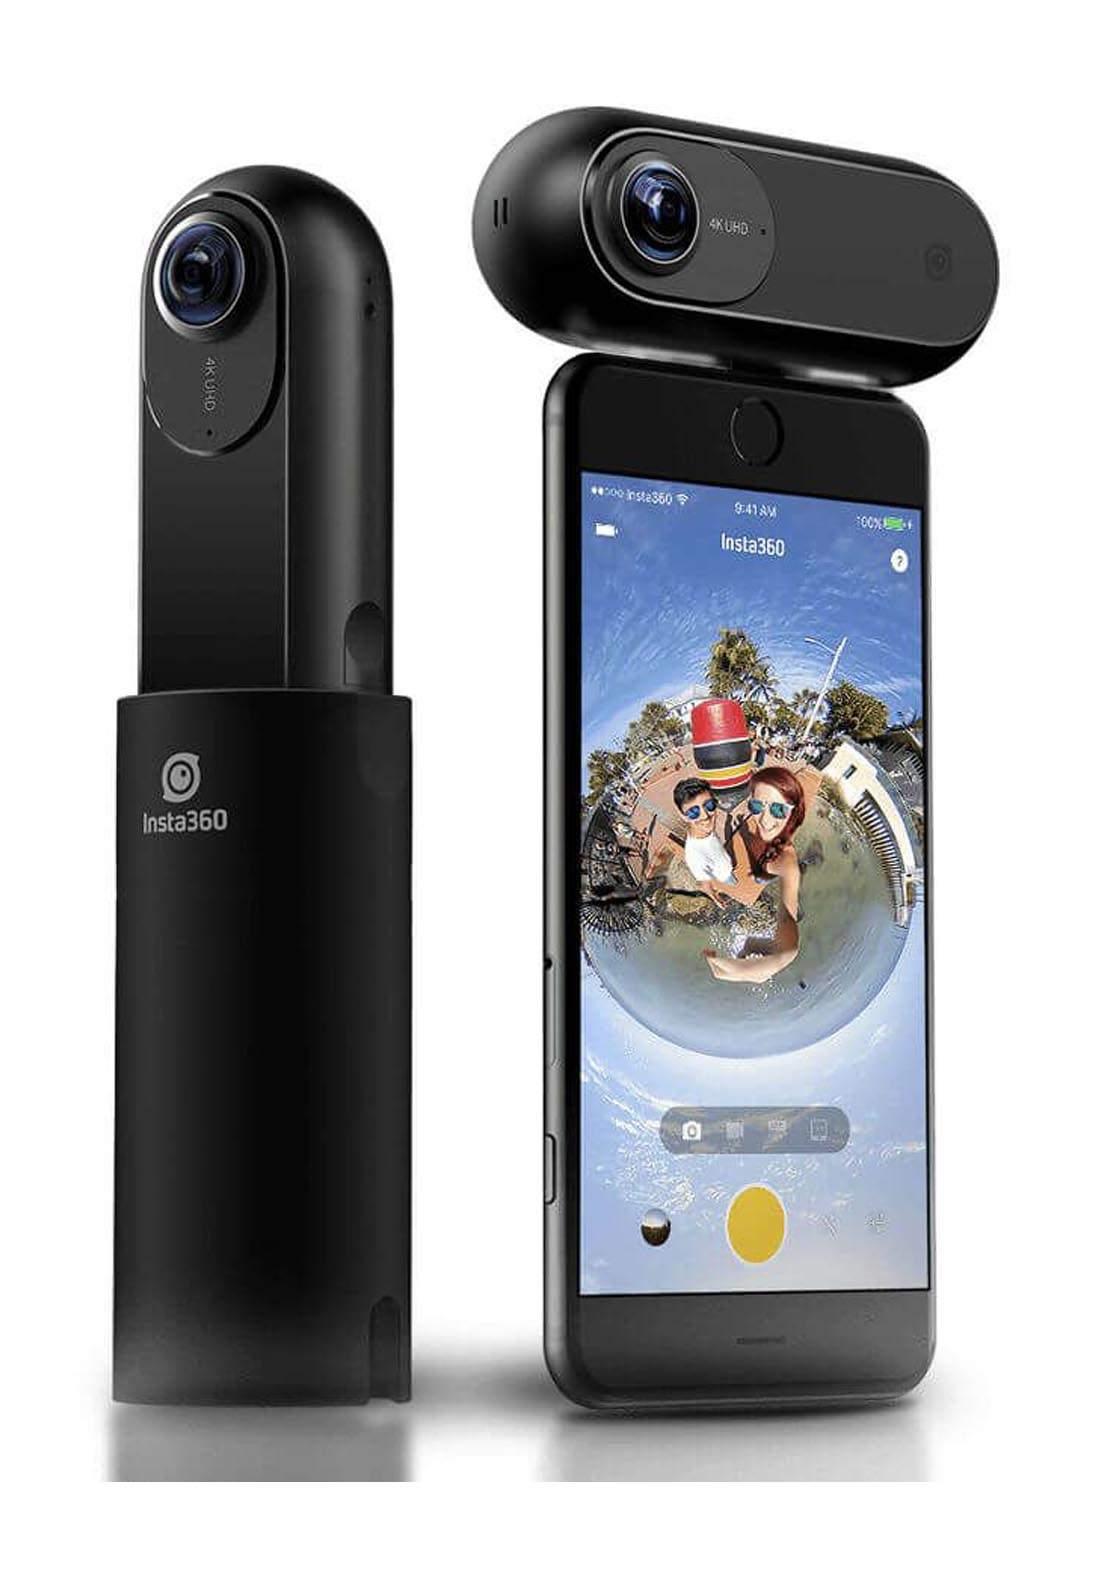 Insta360 ONE 360 Degree Panoramic Video Camera - Black  عدسة كاميرا للهاتف